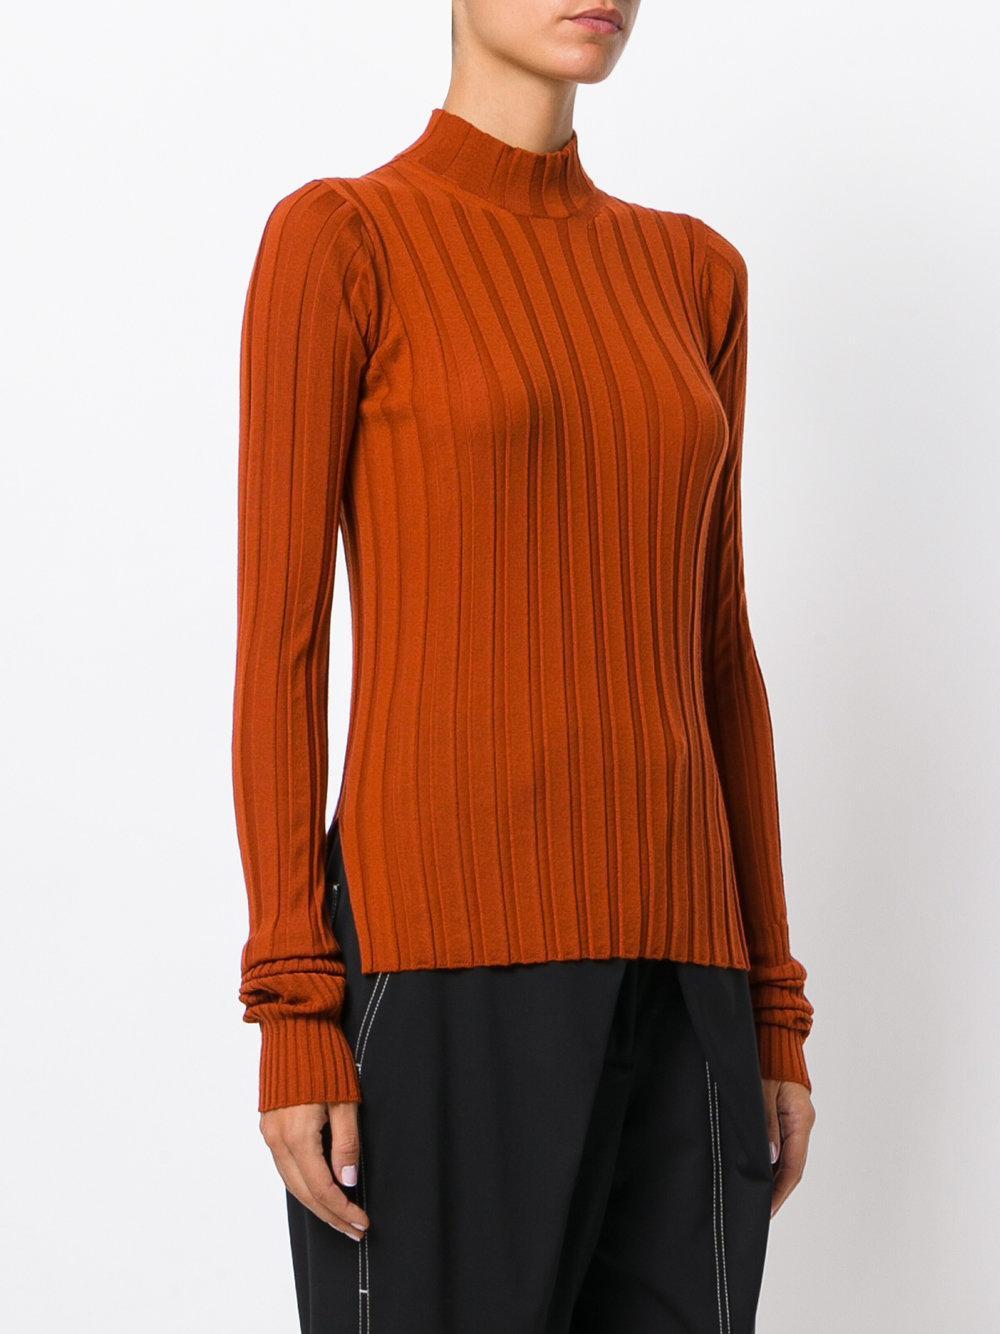 Theory Wide Rib Knit Sweater in Yellow & Orange (Orange)